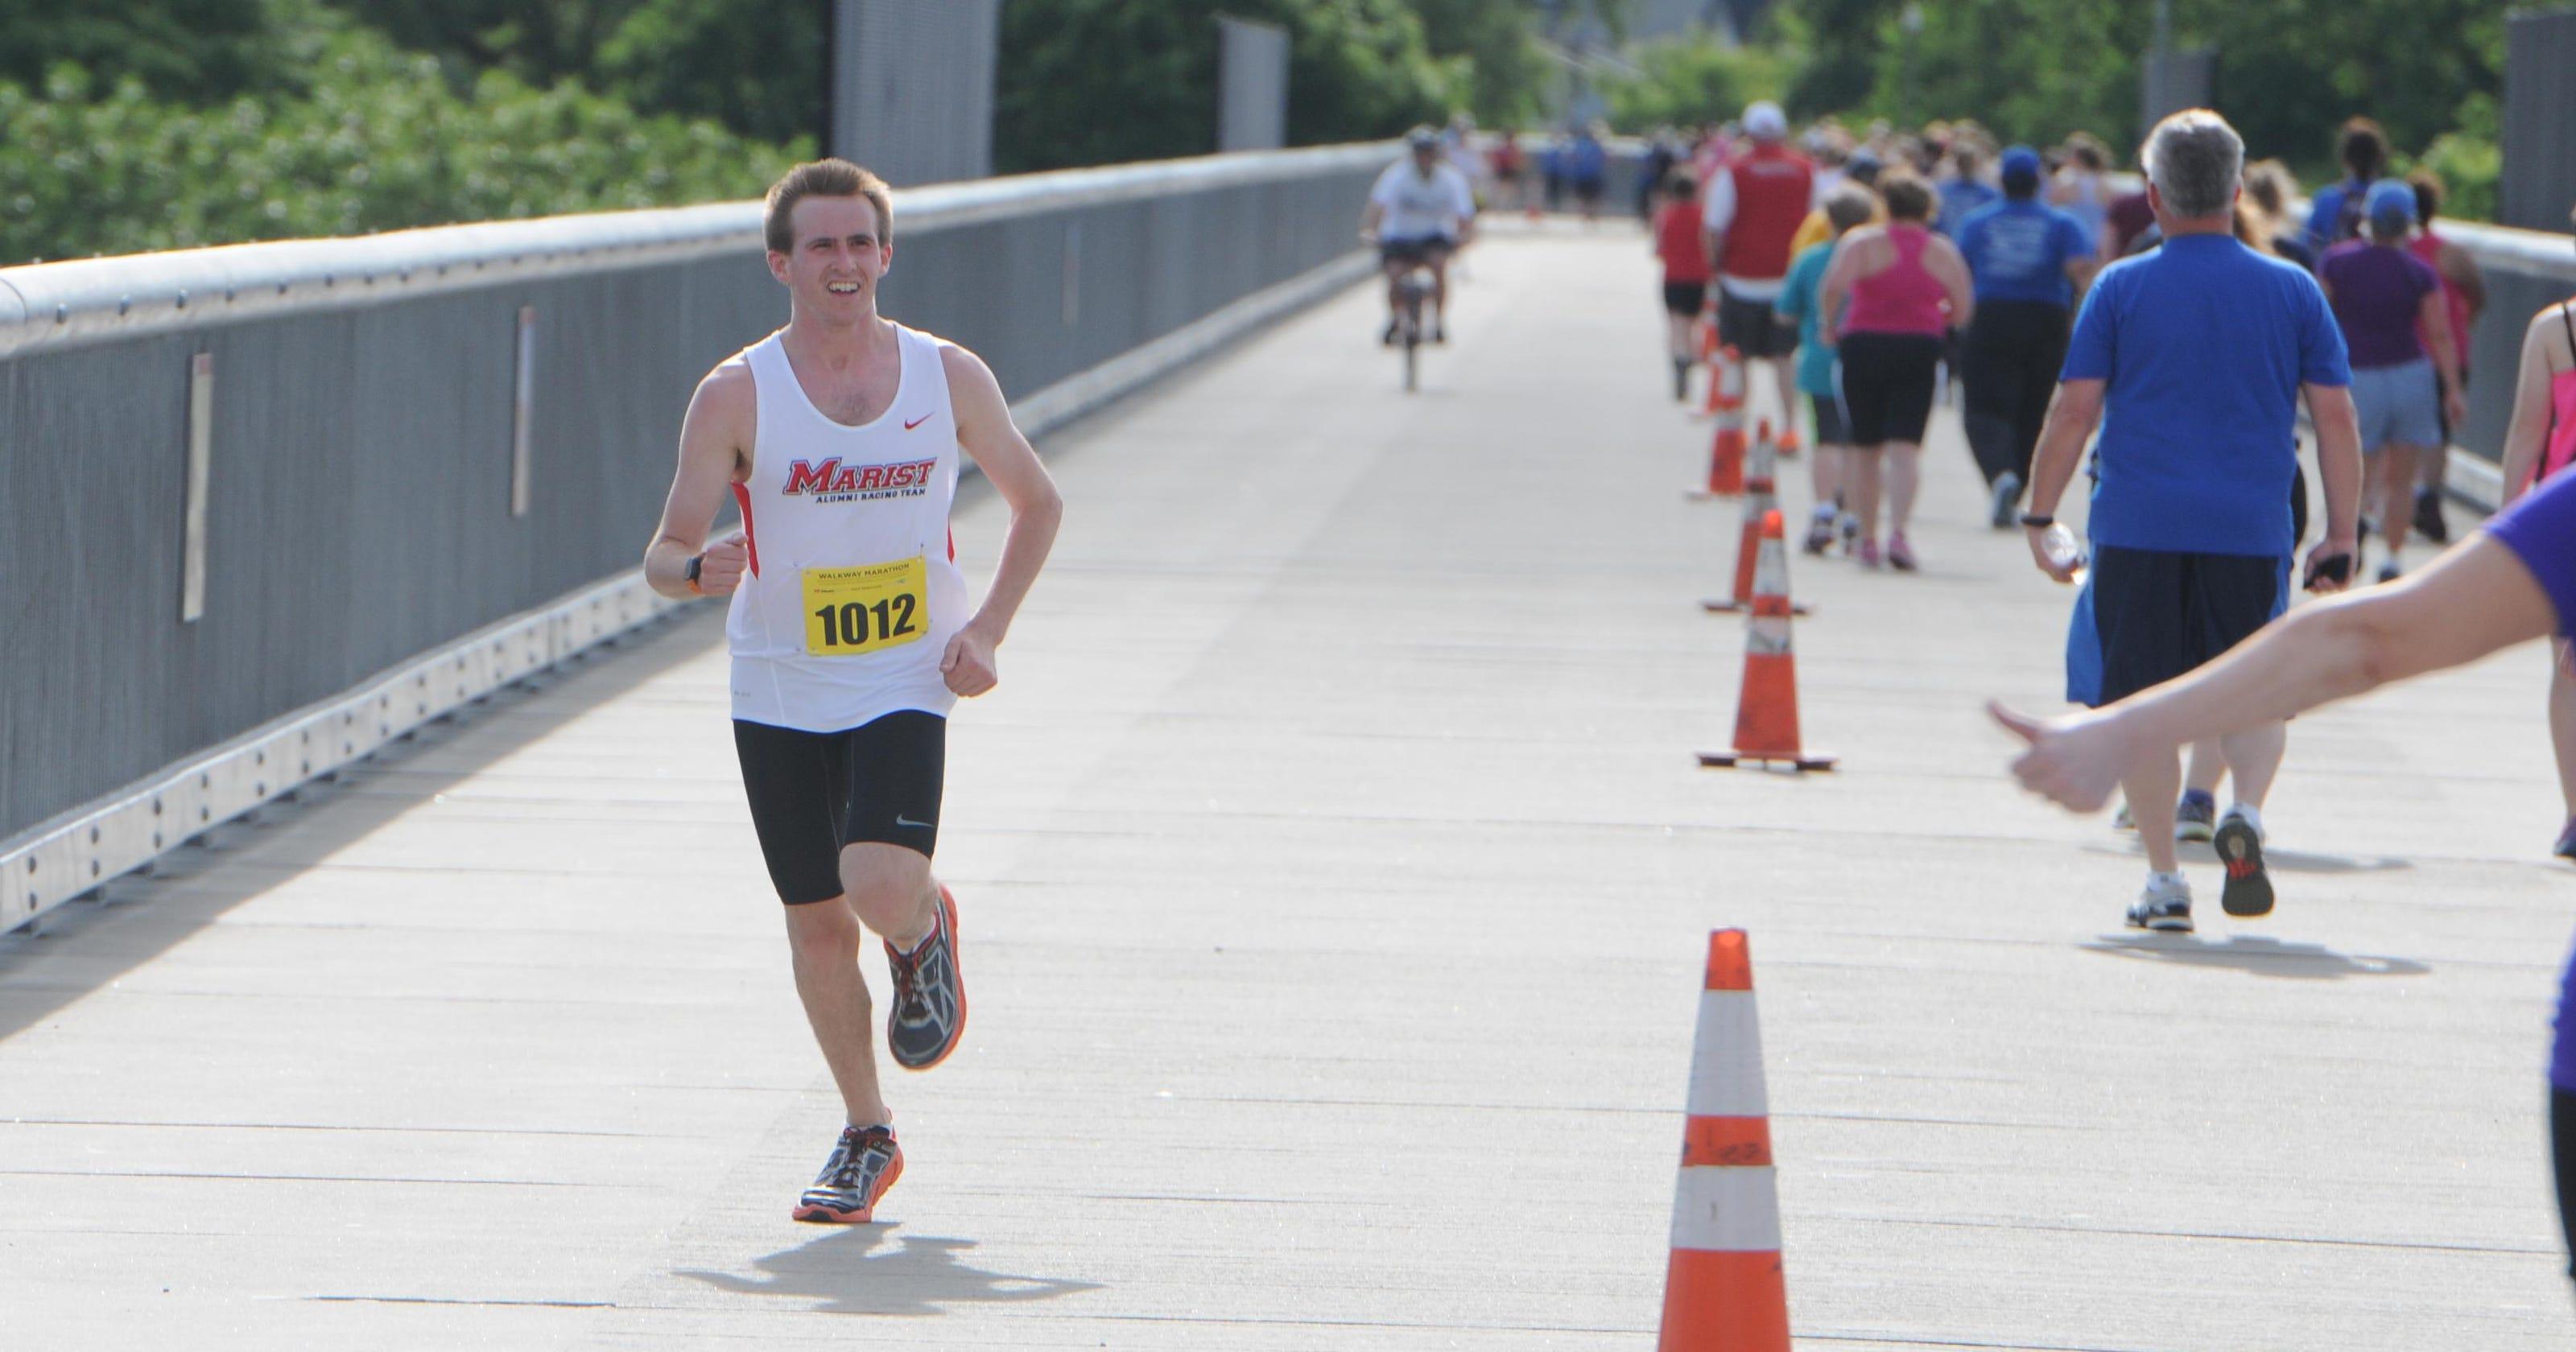 2015 Walkway Marathon Results